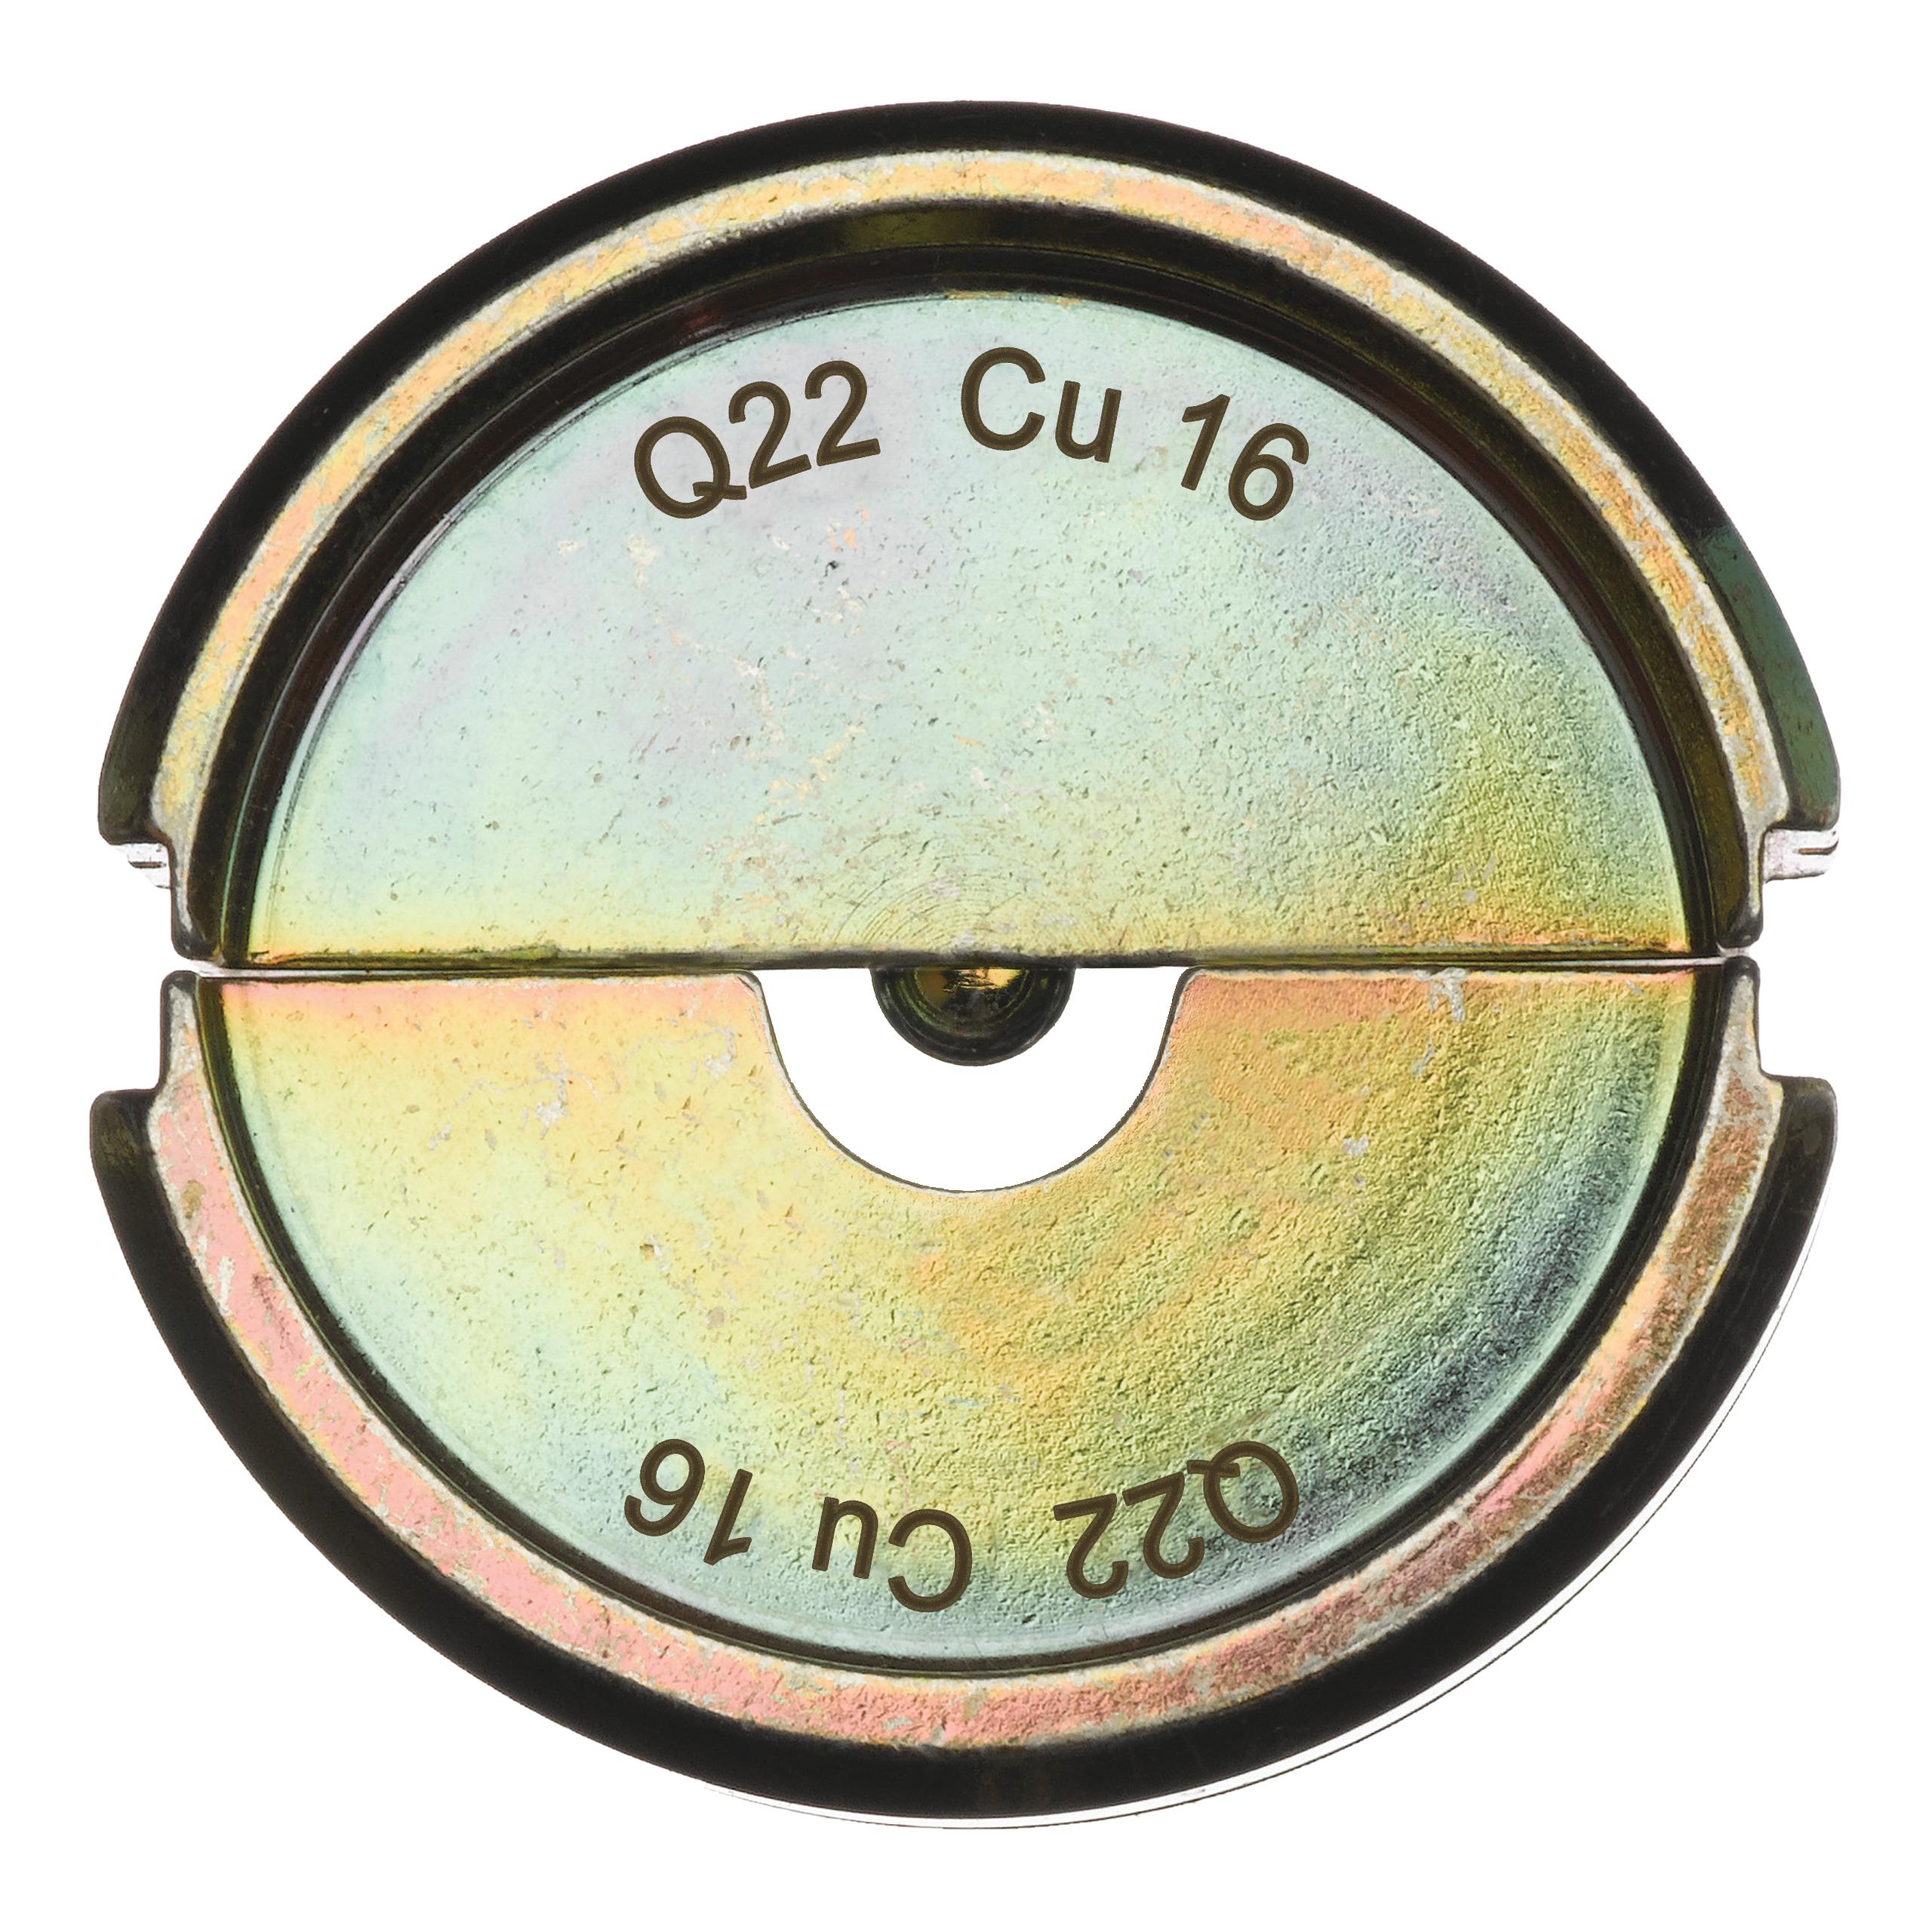 Krimpovací čelisti  Q22 CU 16